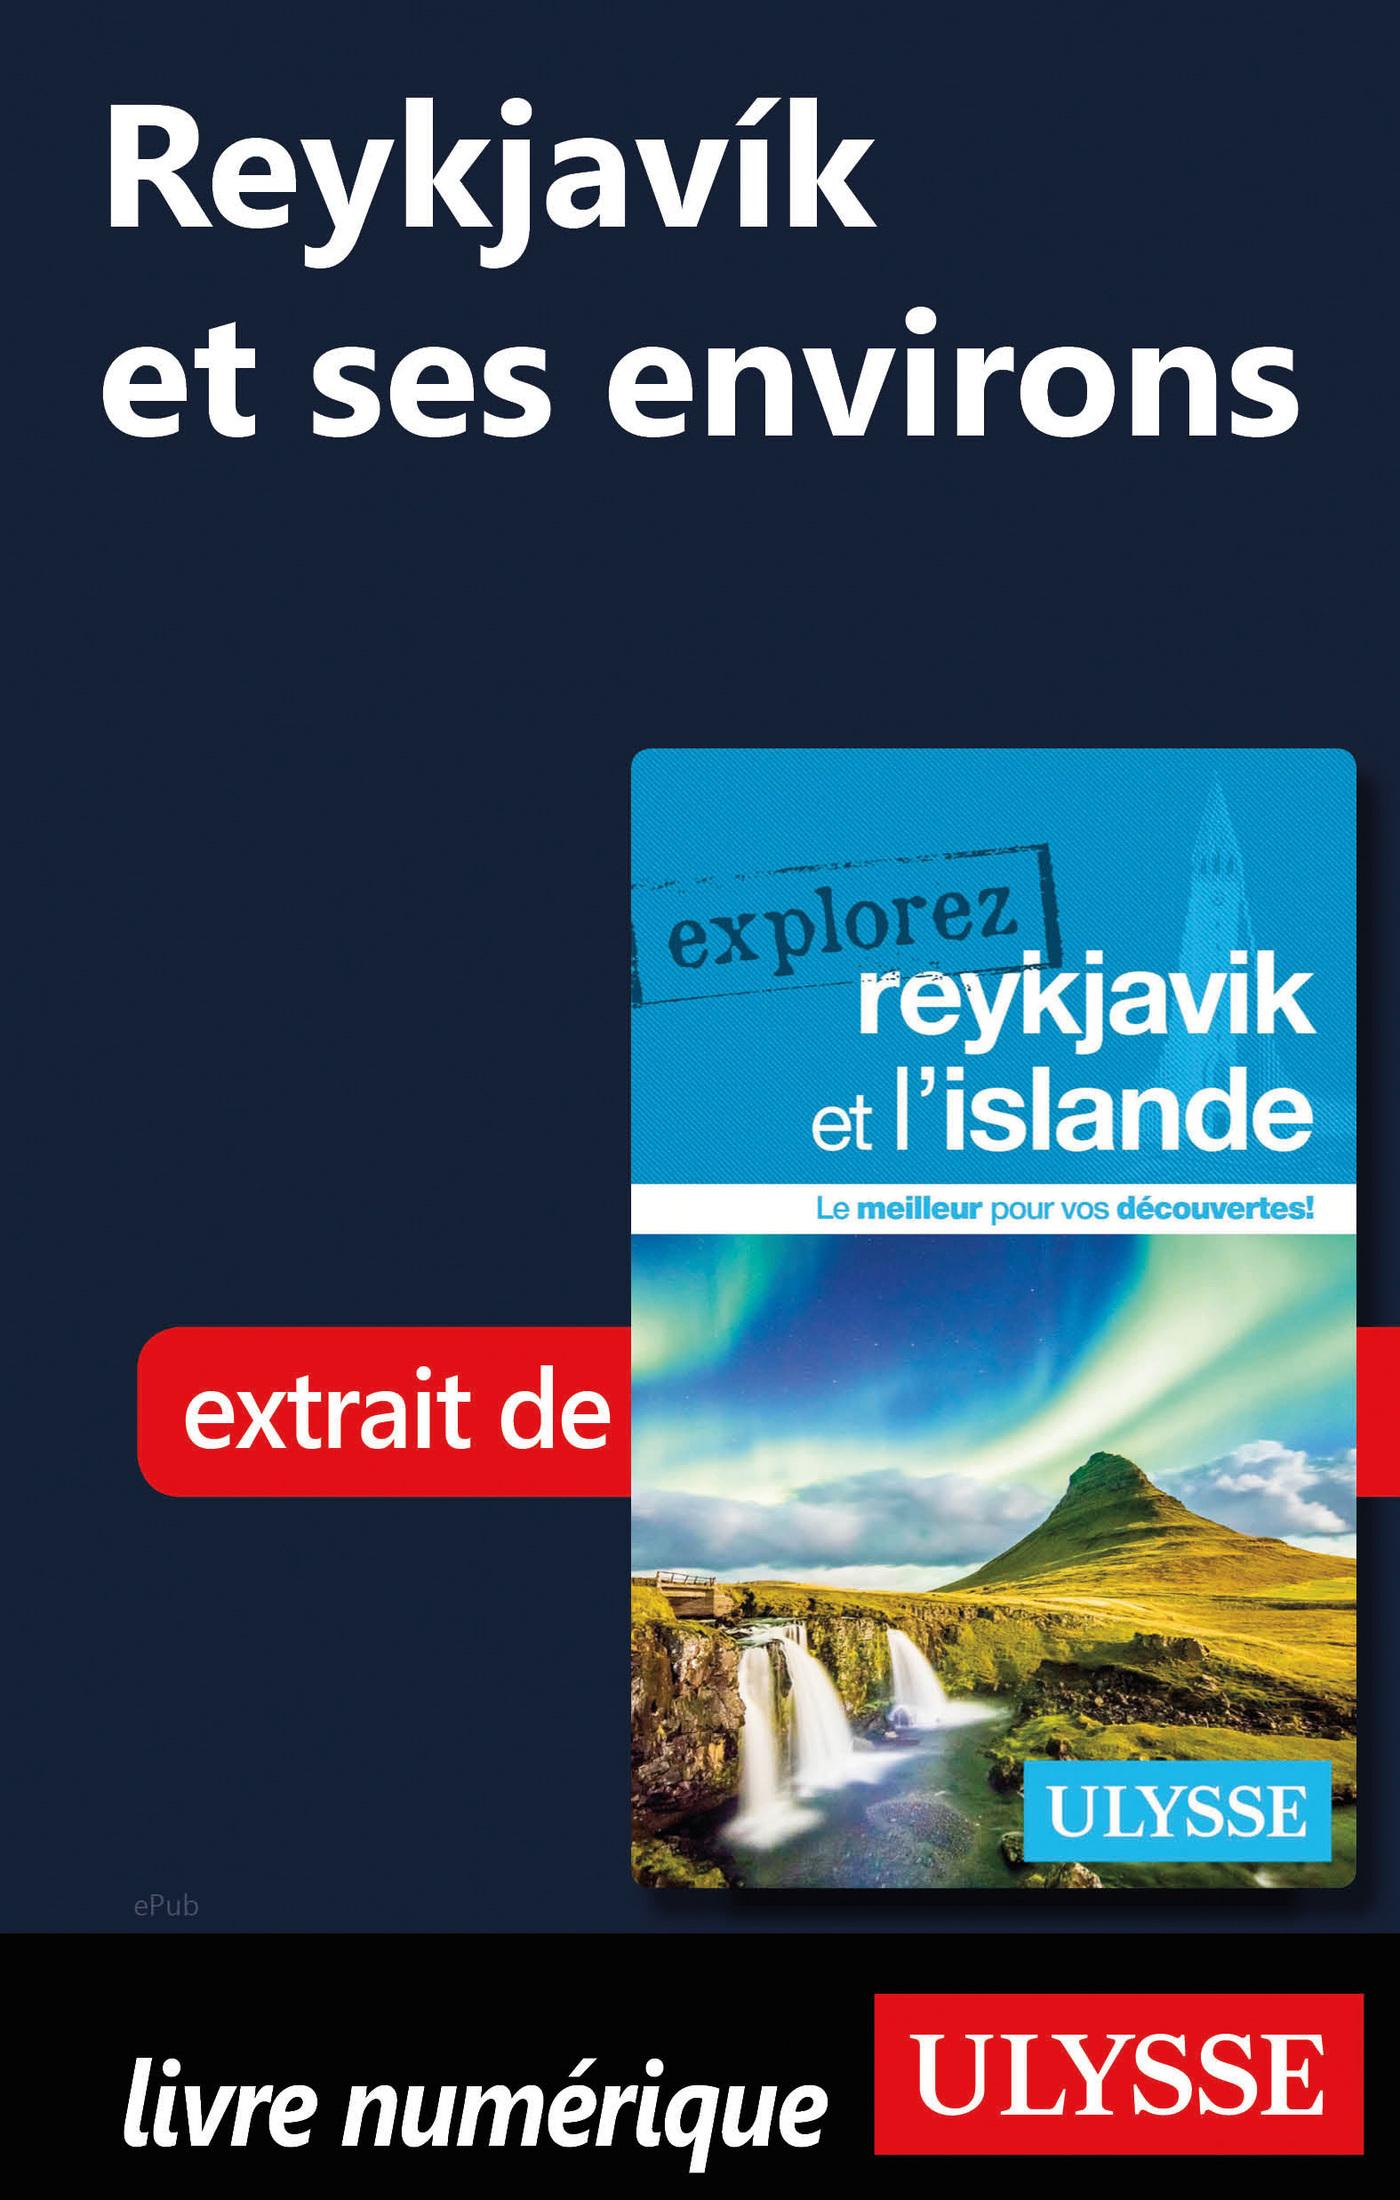 Reykjavik et ses environs